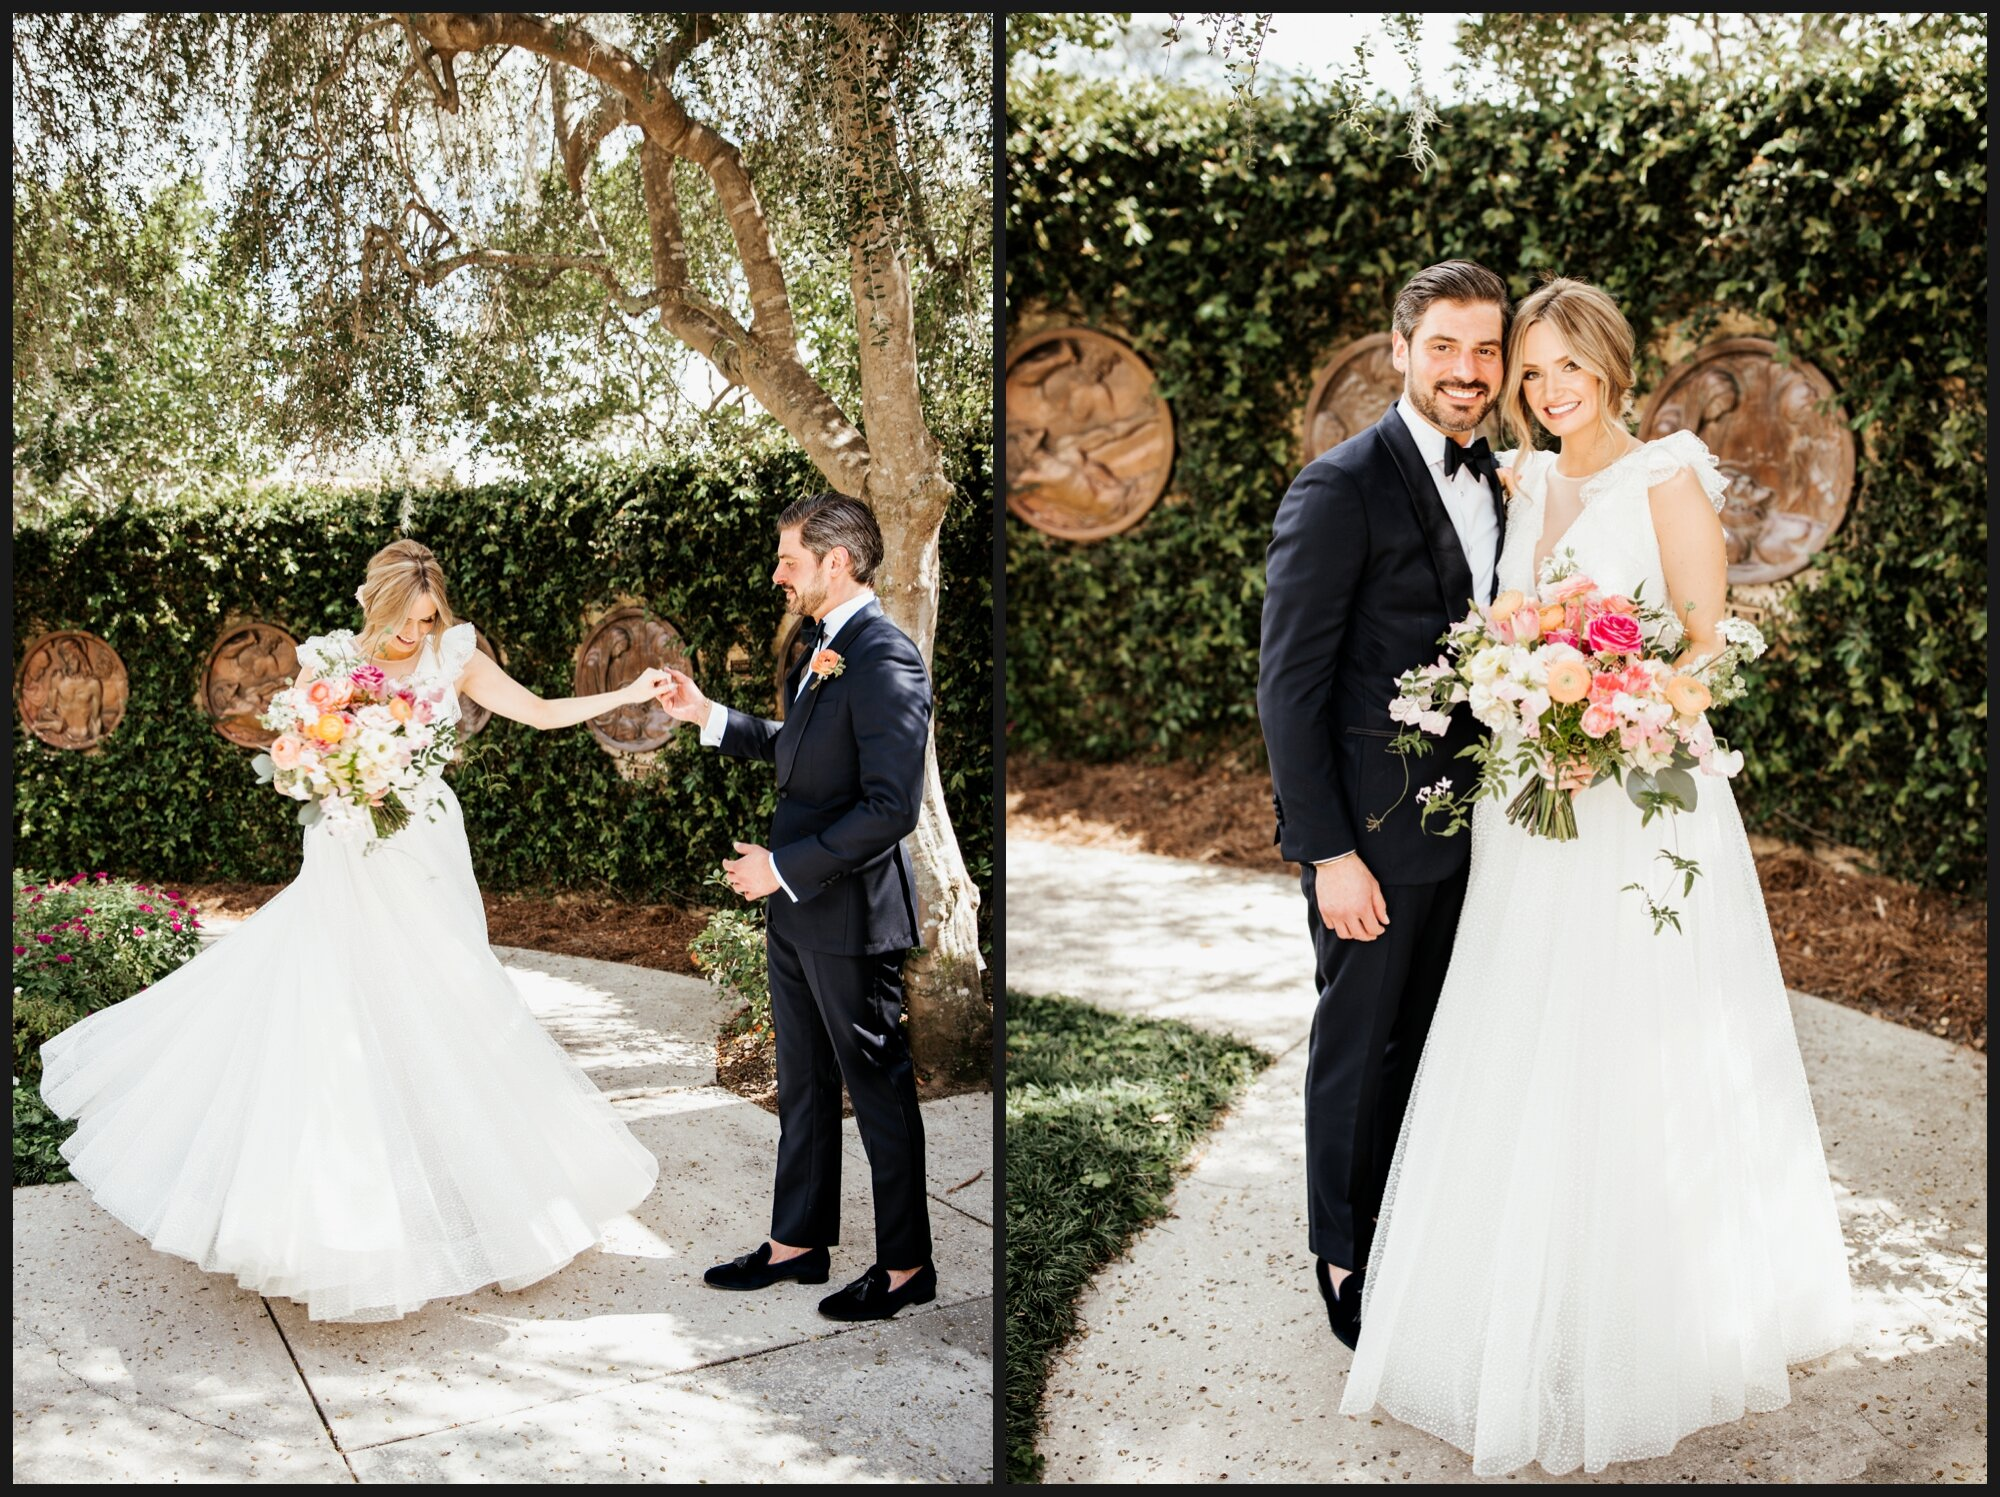 Orlando-Wedding-Photographer-destination-wedding-photographer-florida-wedding-photographer-hawaii-wedding-photographer_0702.jpg